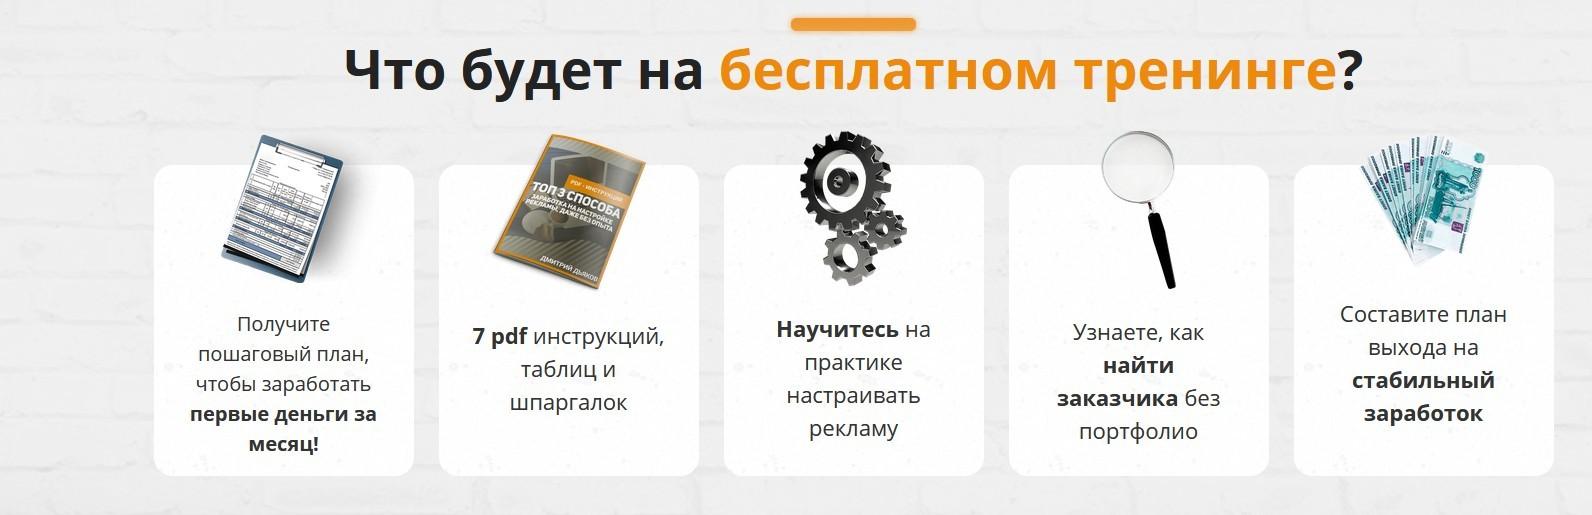 Специалист по рекламе Вконтакте - 1